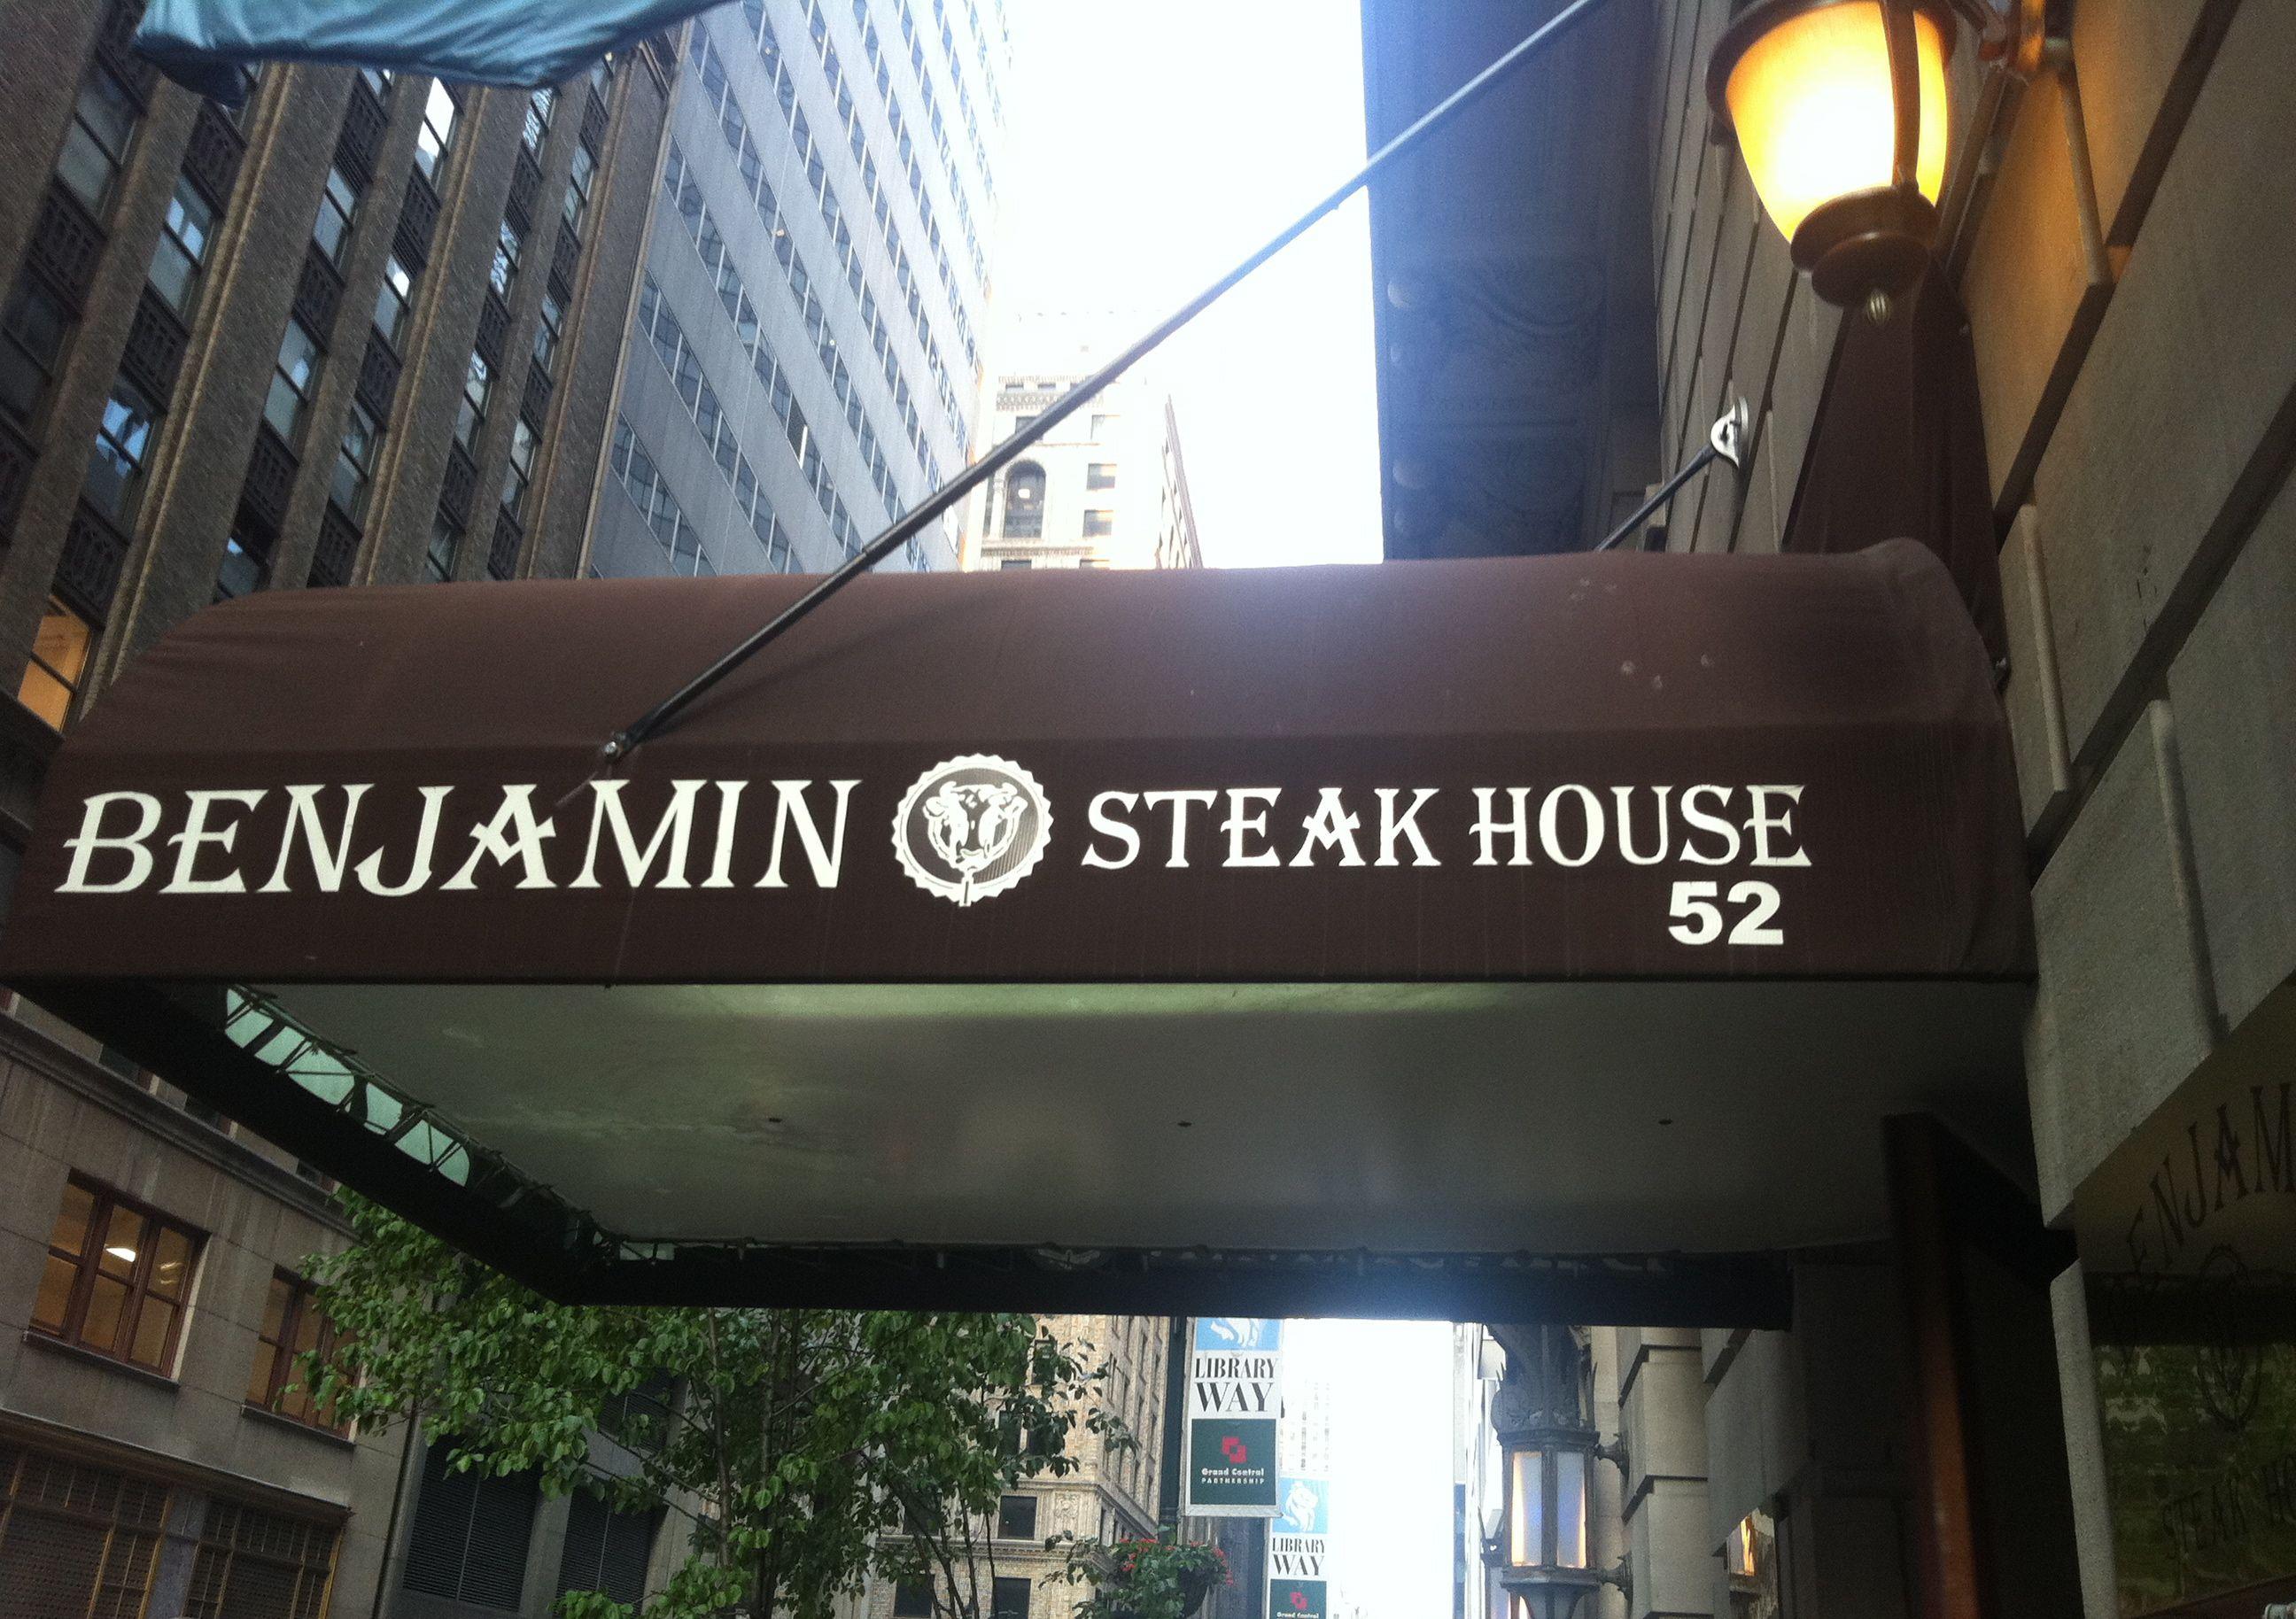 New York Ny Benjamin Steak House Try The Rib Eye Sandwich Usda Prime Lunch New York City Fall Travel Steakhouse